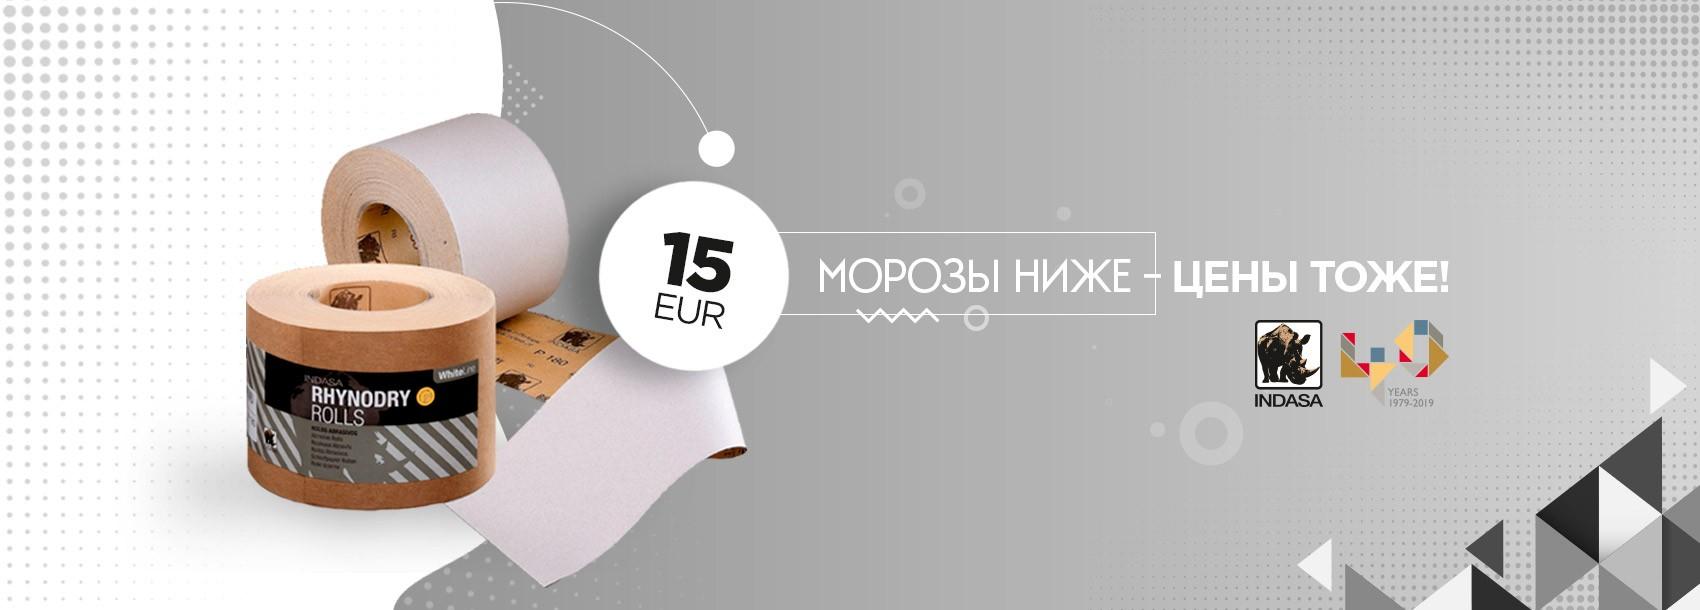 Специальная цена на наждачную бумагу Indasa – 15 EUR